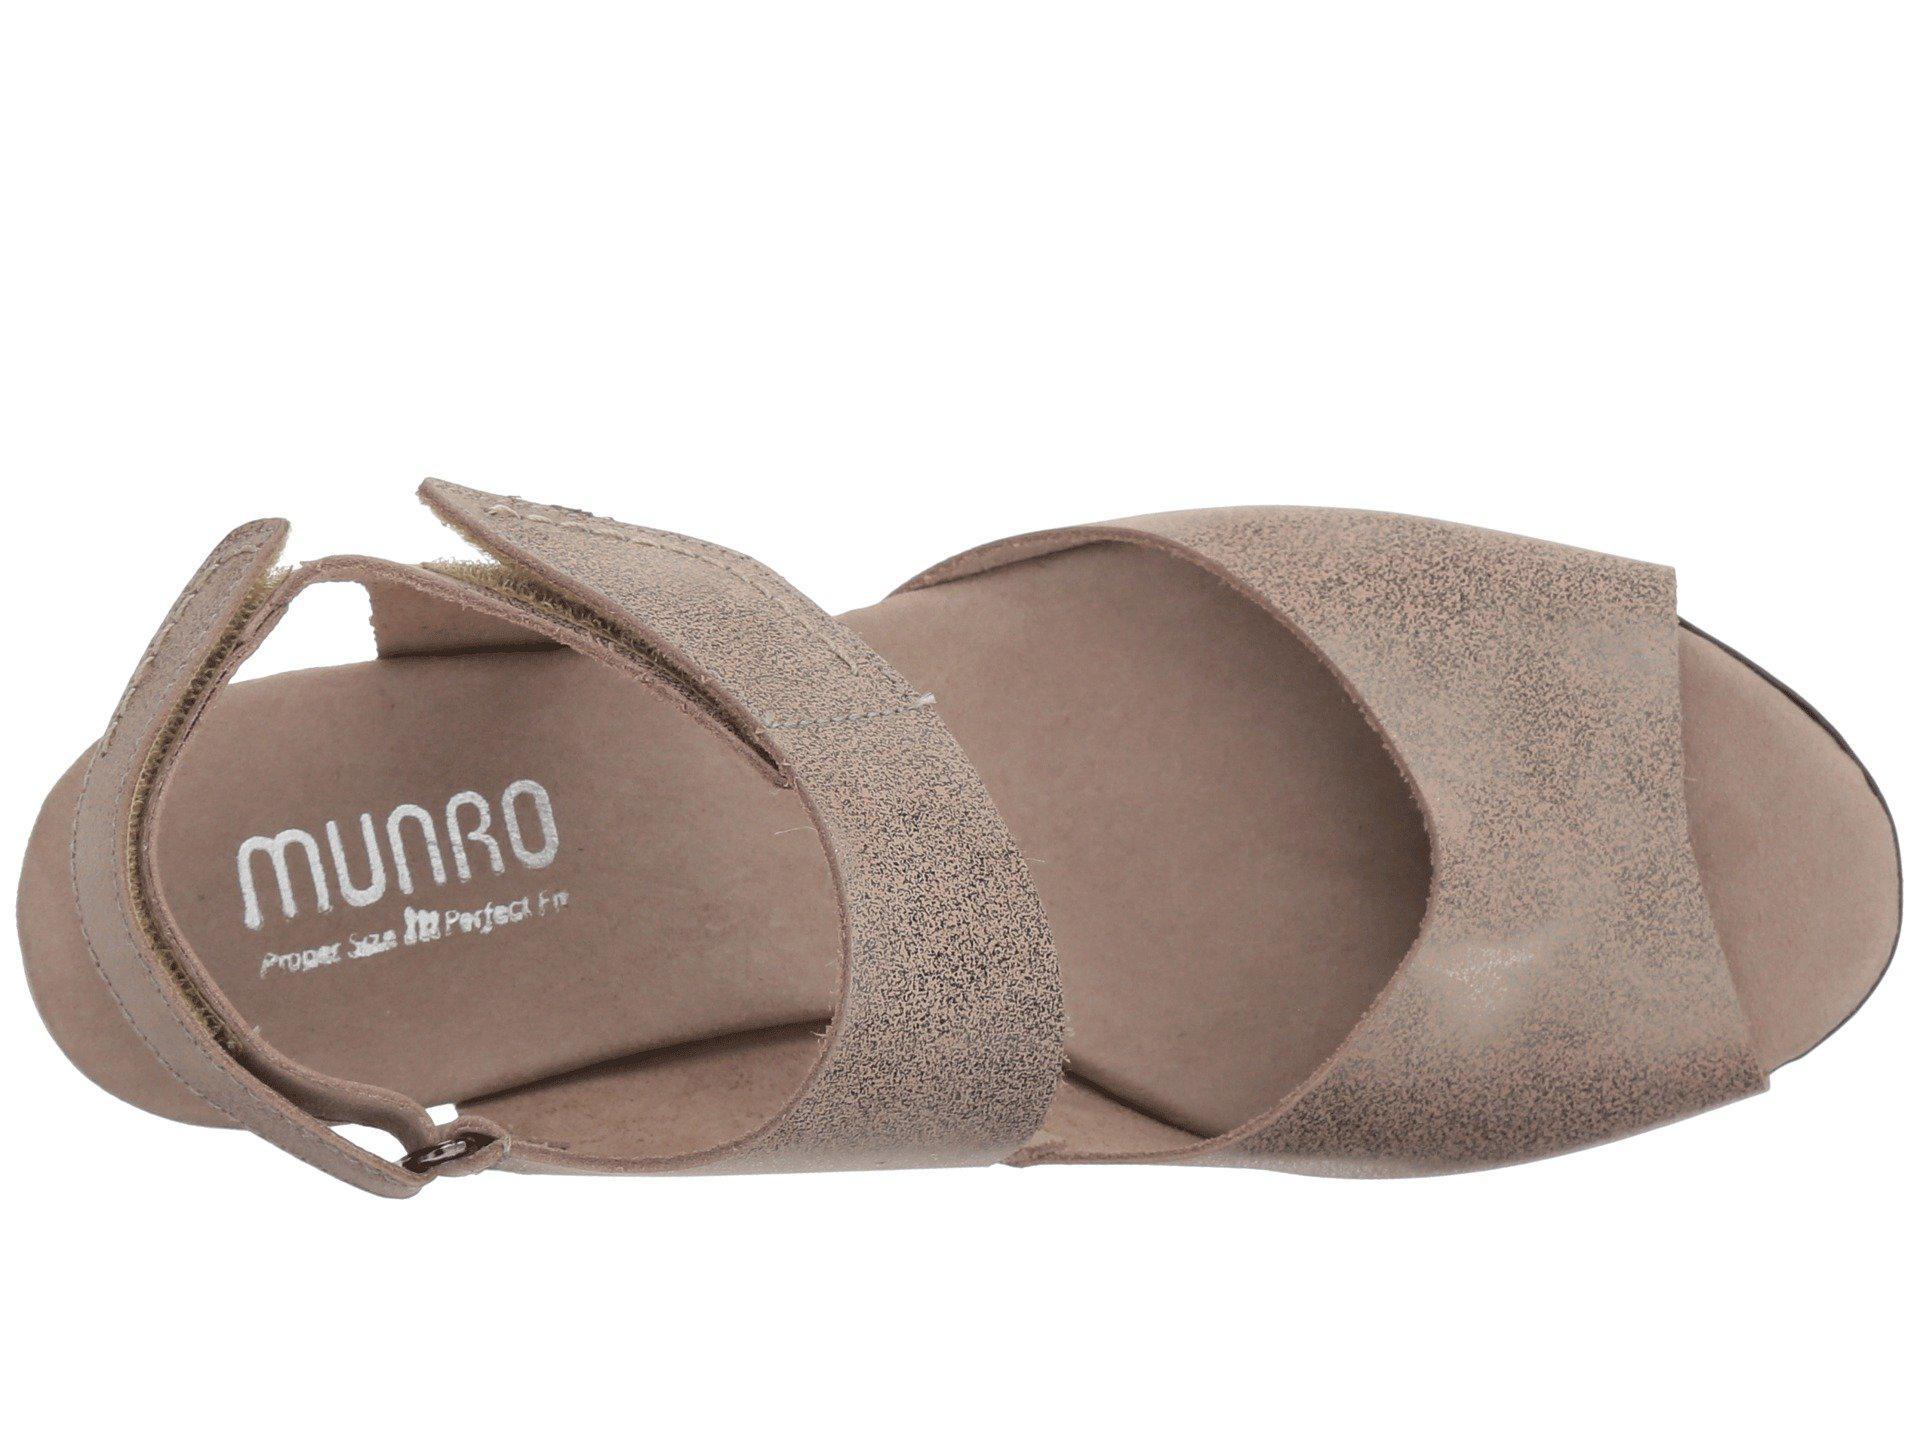 f79f4657181 Munro - Multicolor Fabiana (black Nubuck) Women s Sandals - Lyst. View  fullscreen